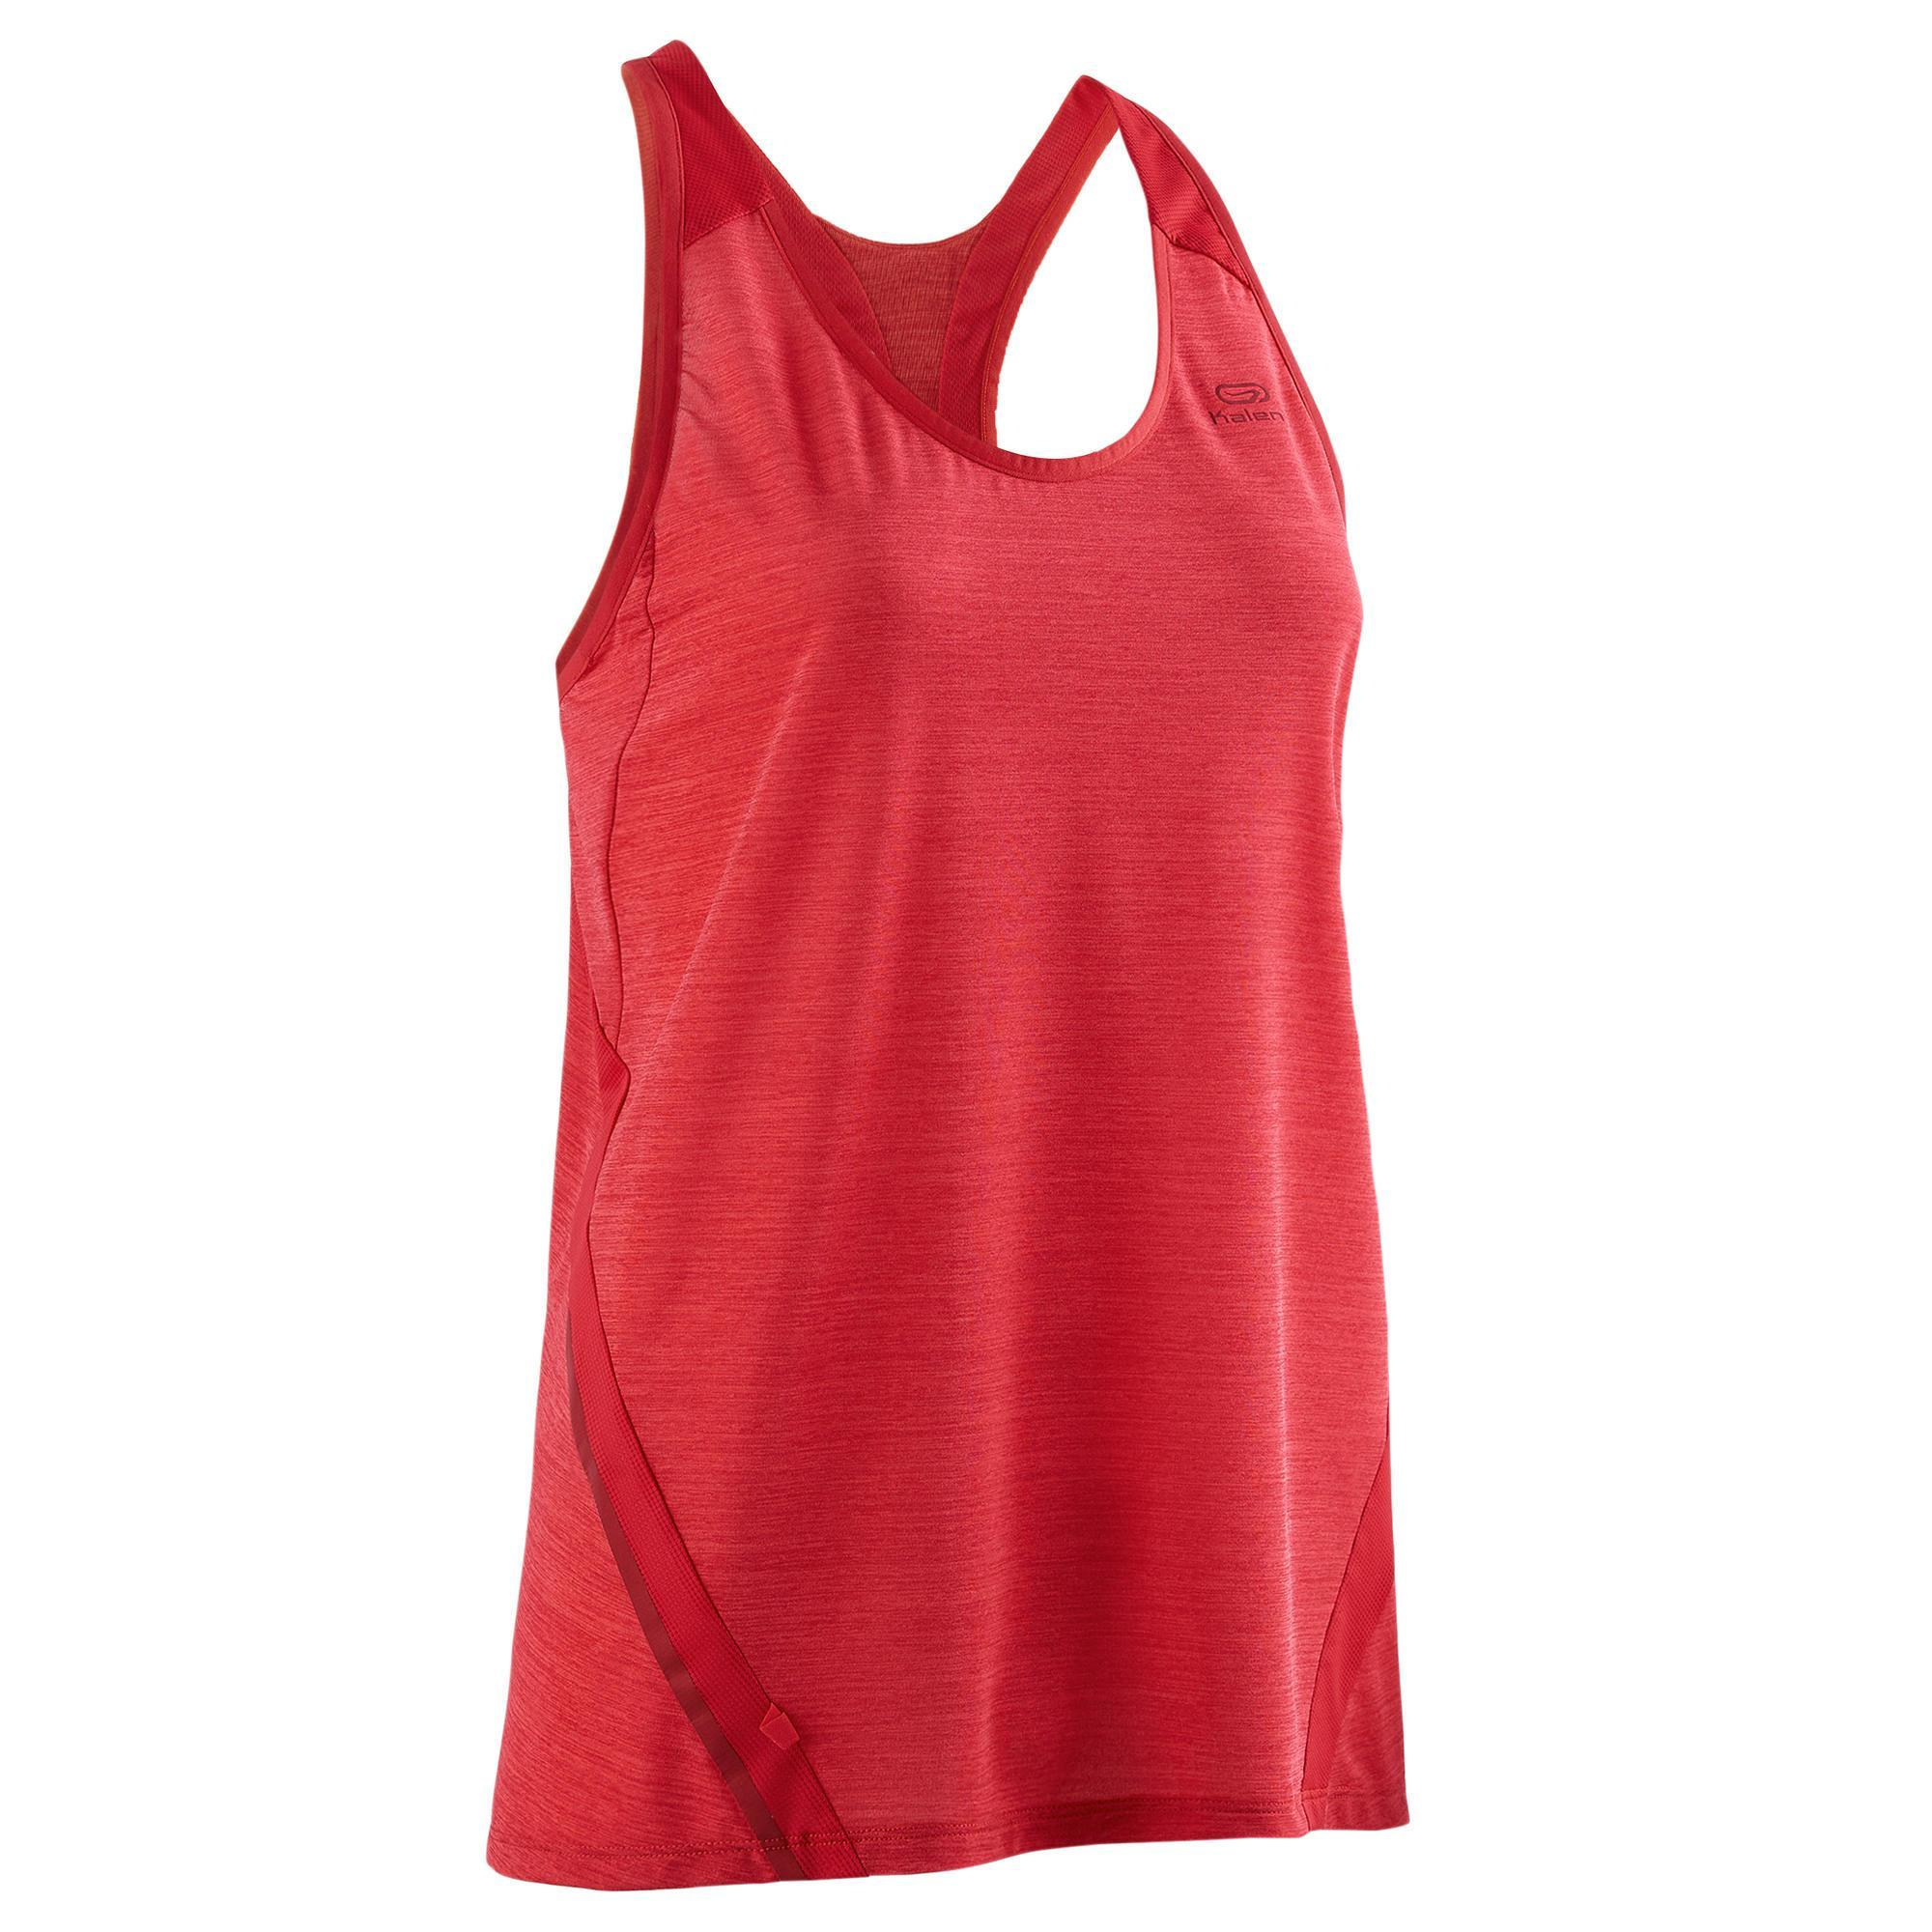 Lauftop Run Light Damen rot | Sportbekleidung > Sporttops > Lauftops | Rot | Kalenji